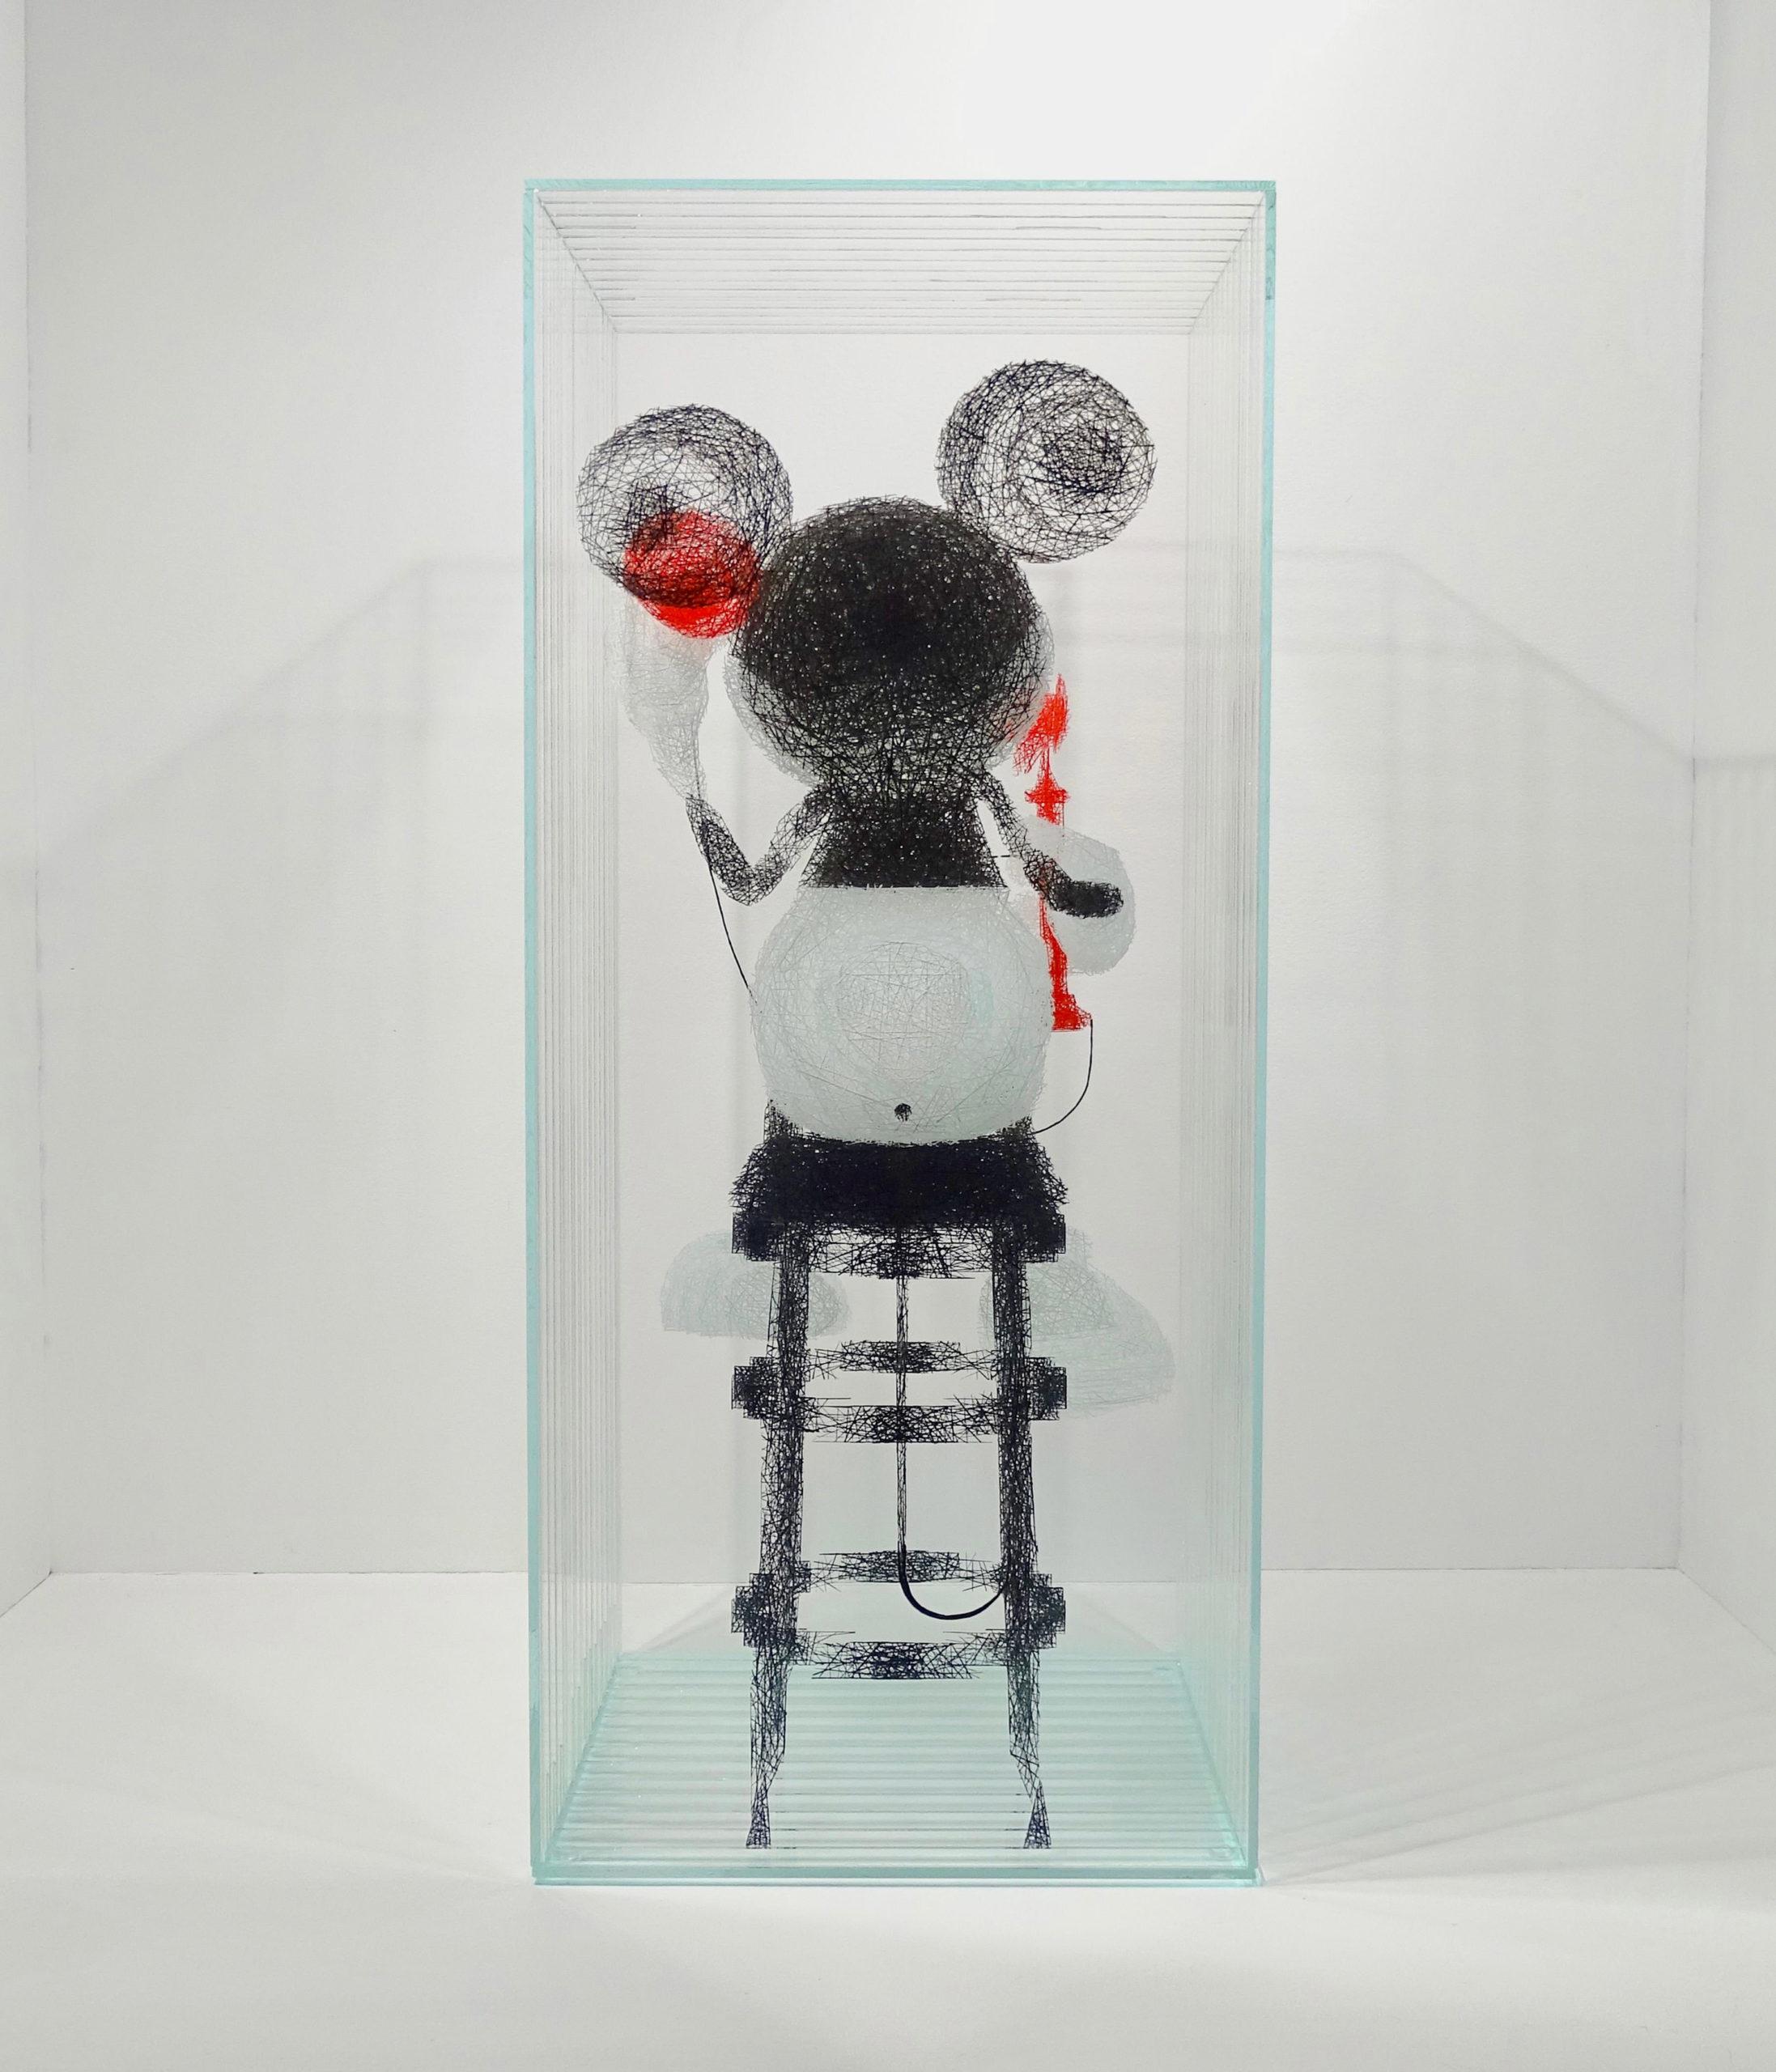 1-sebastien-creteur-DBAF-c-galerie-bettina-art-contemporain-paris.jpg